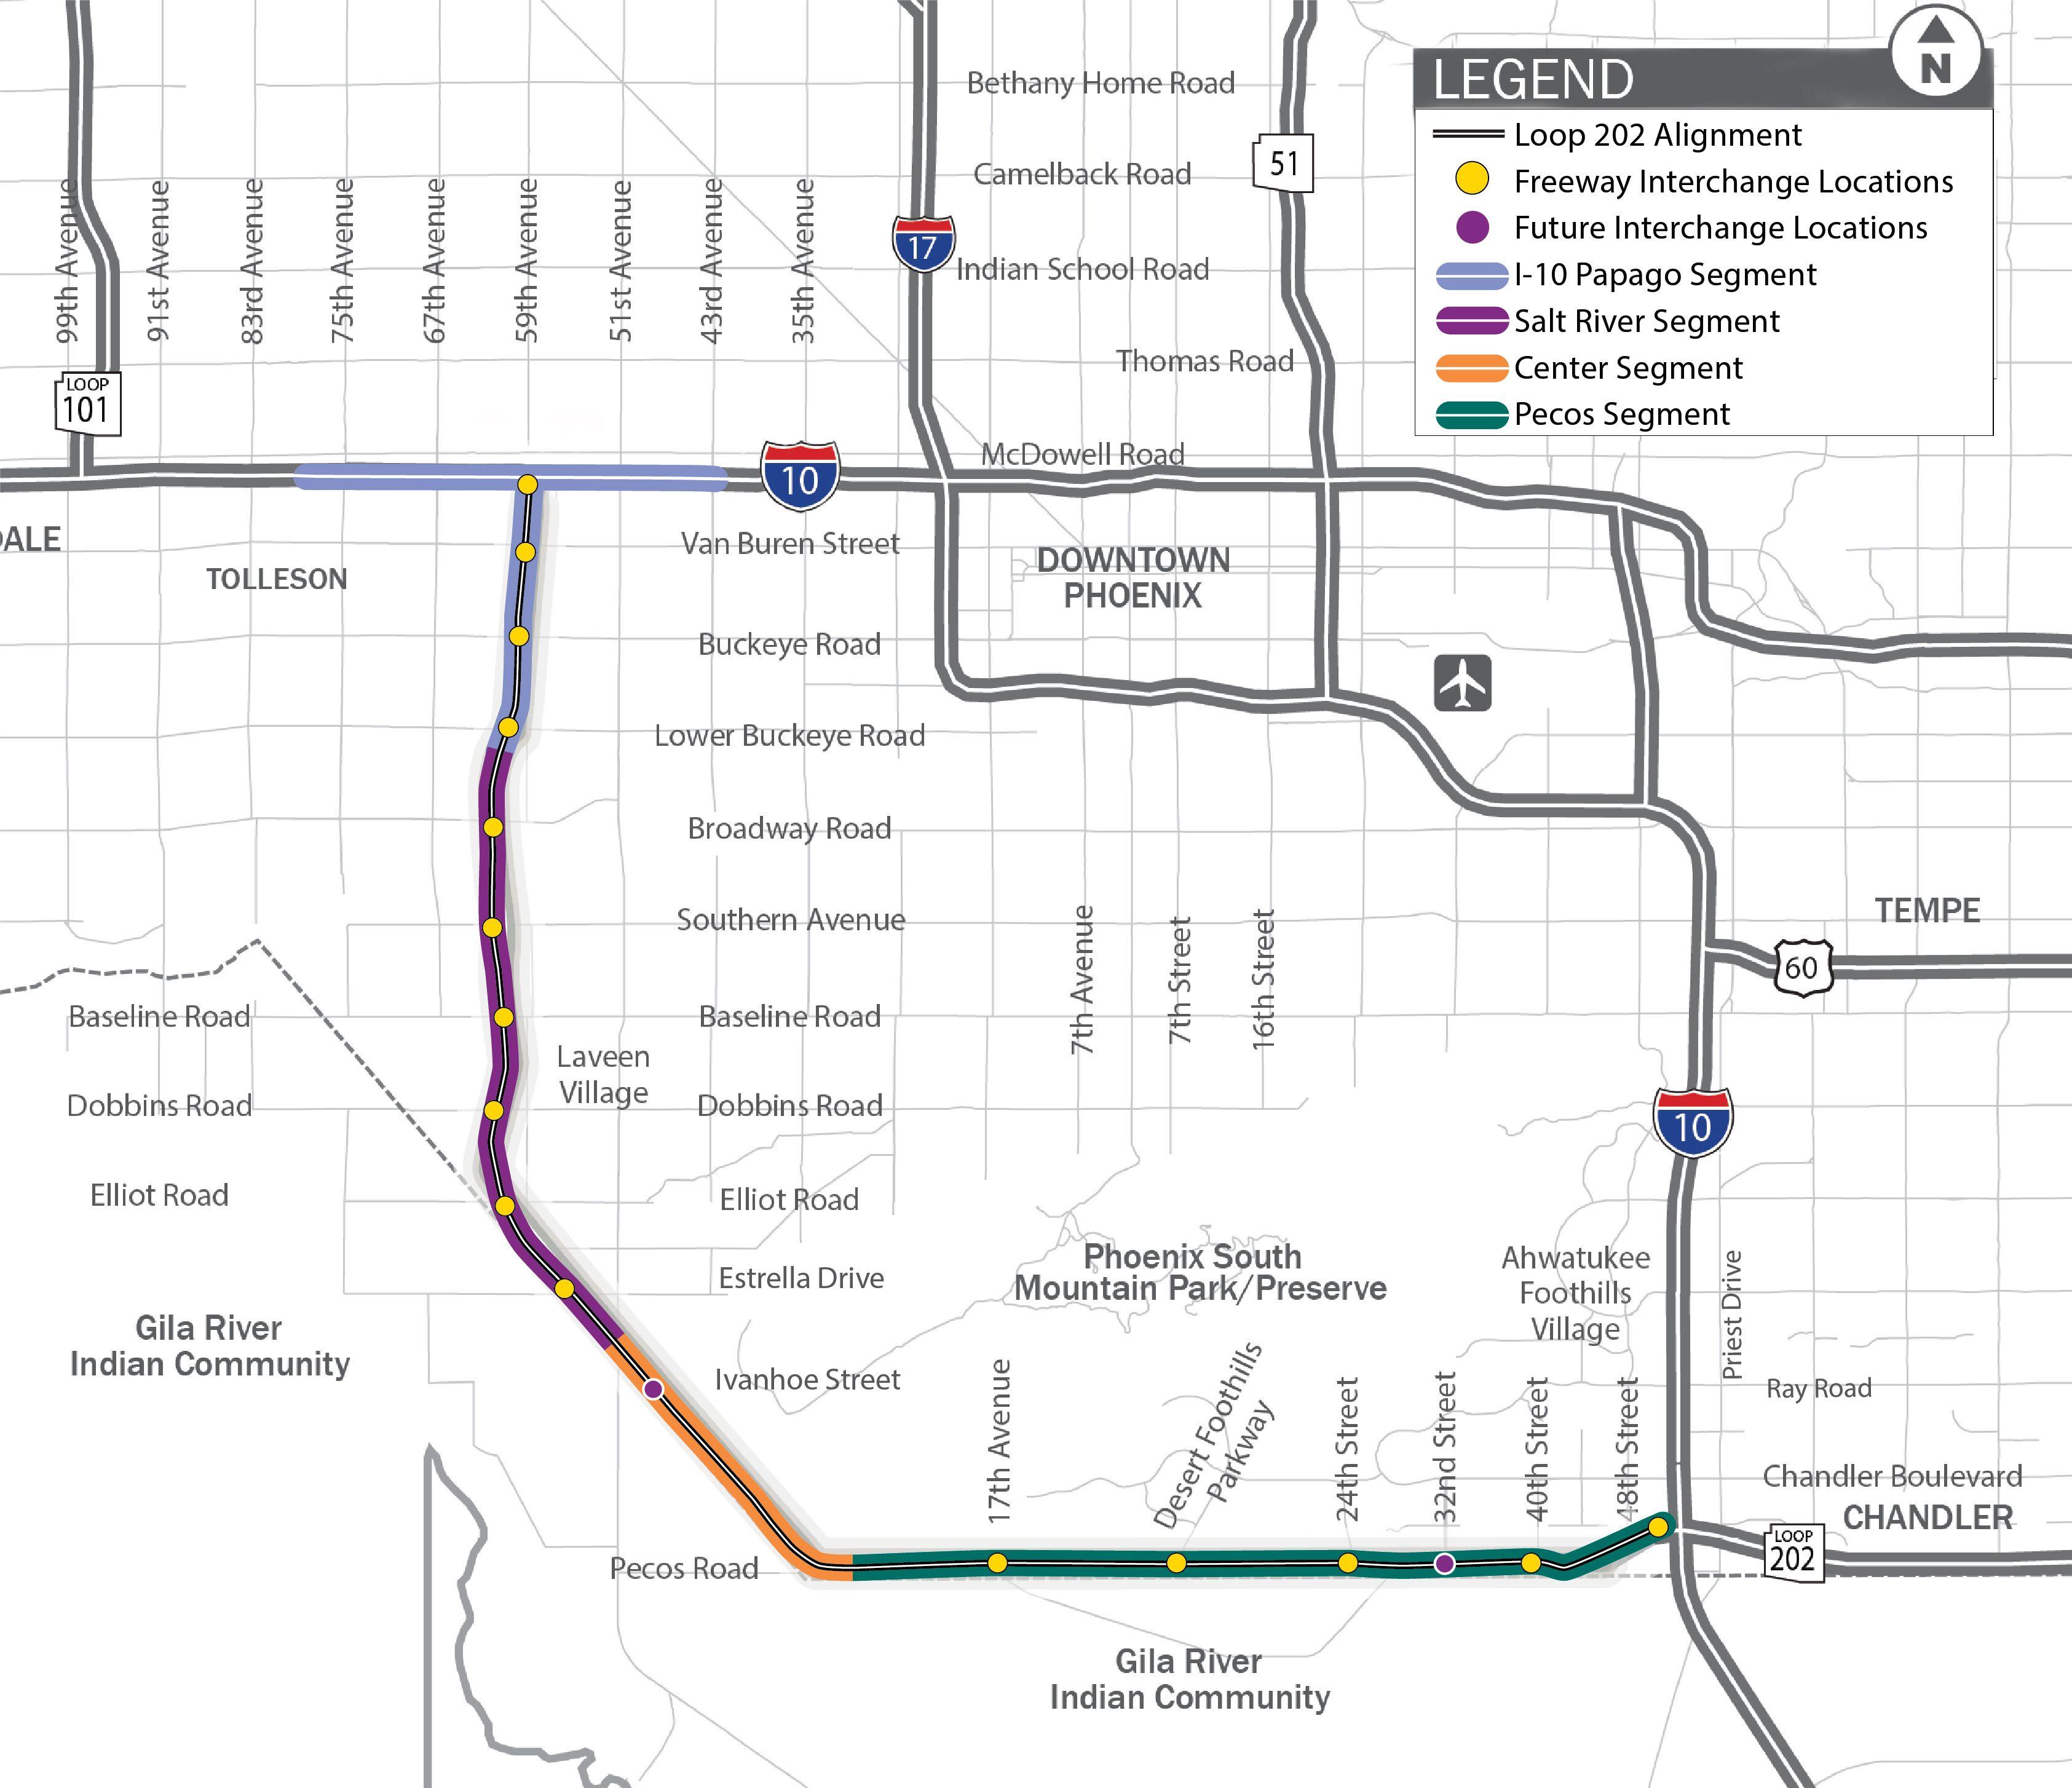 South mountain 202 freeway phoenixchandler opens